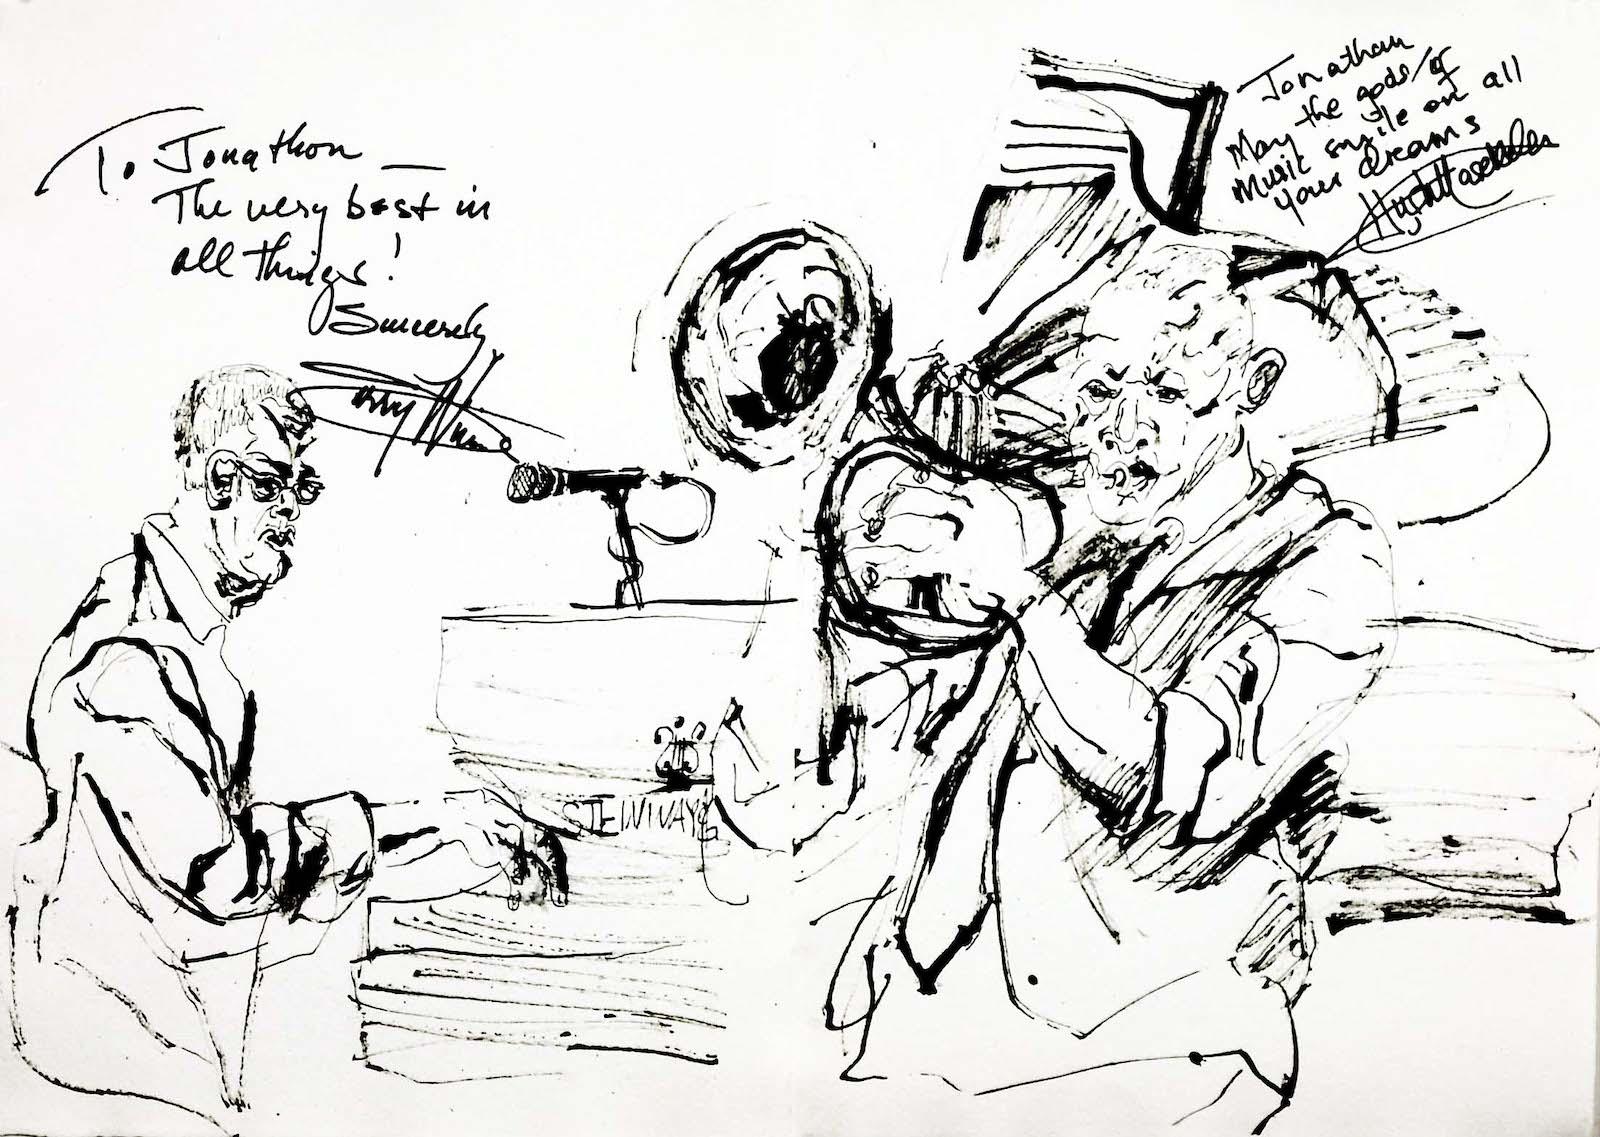 Hugh masekela and larry willis at jazz standard 2012